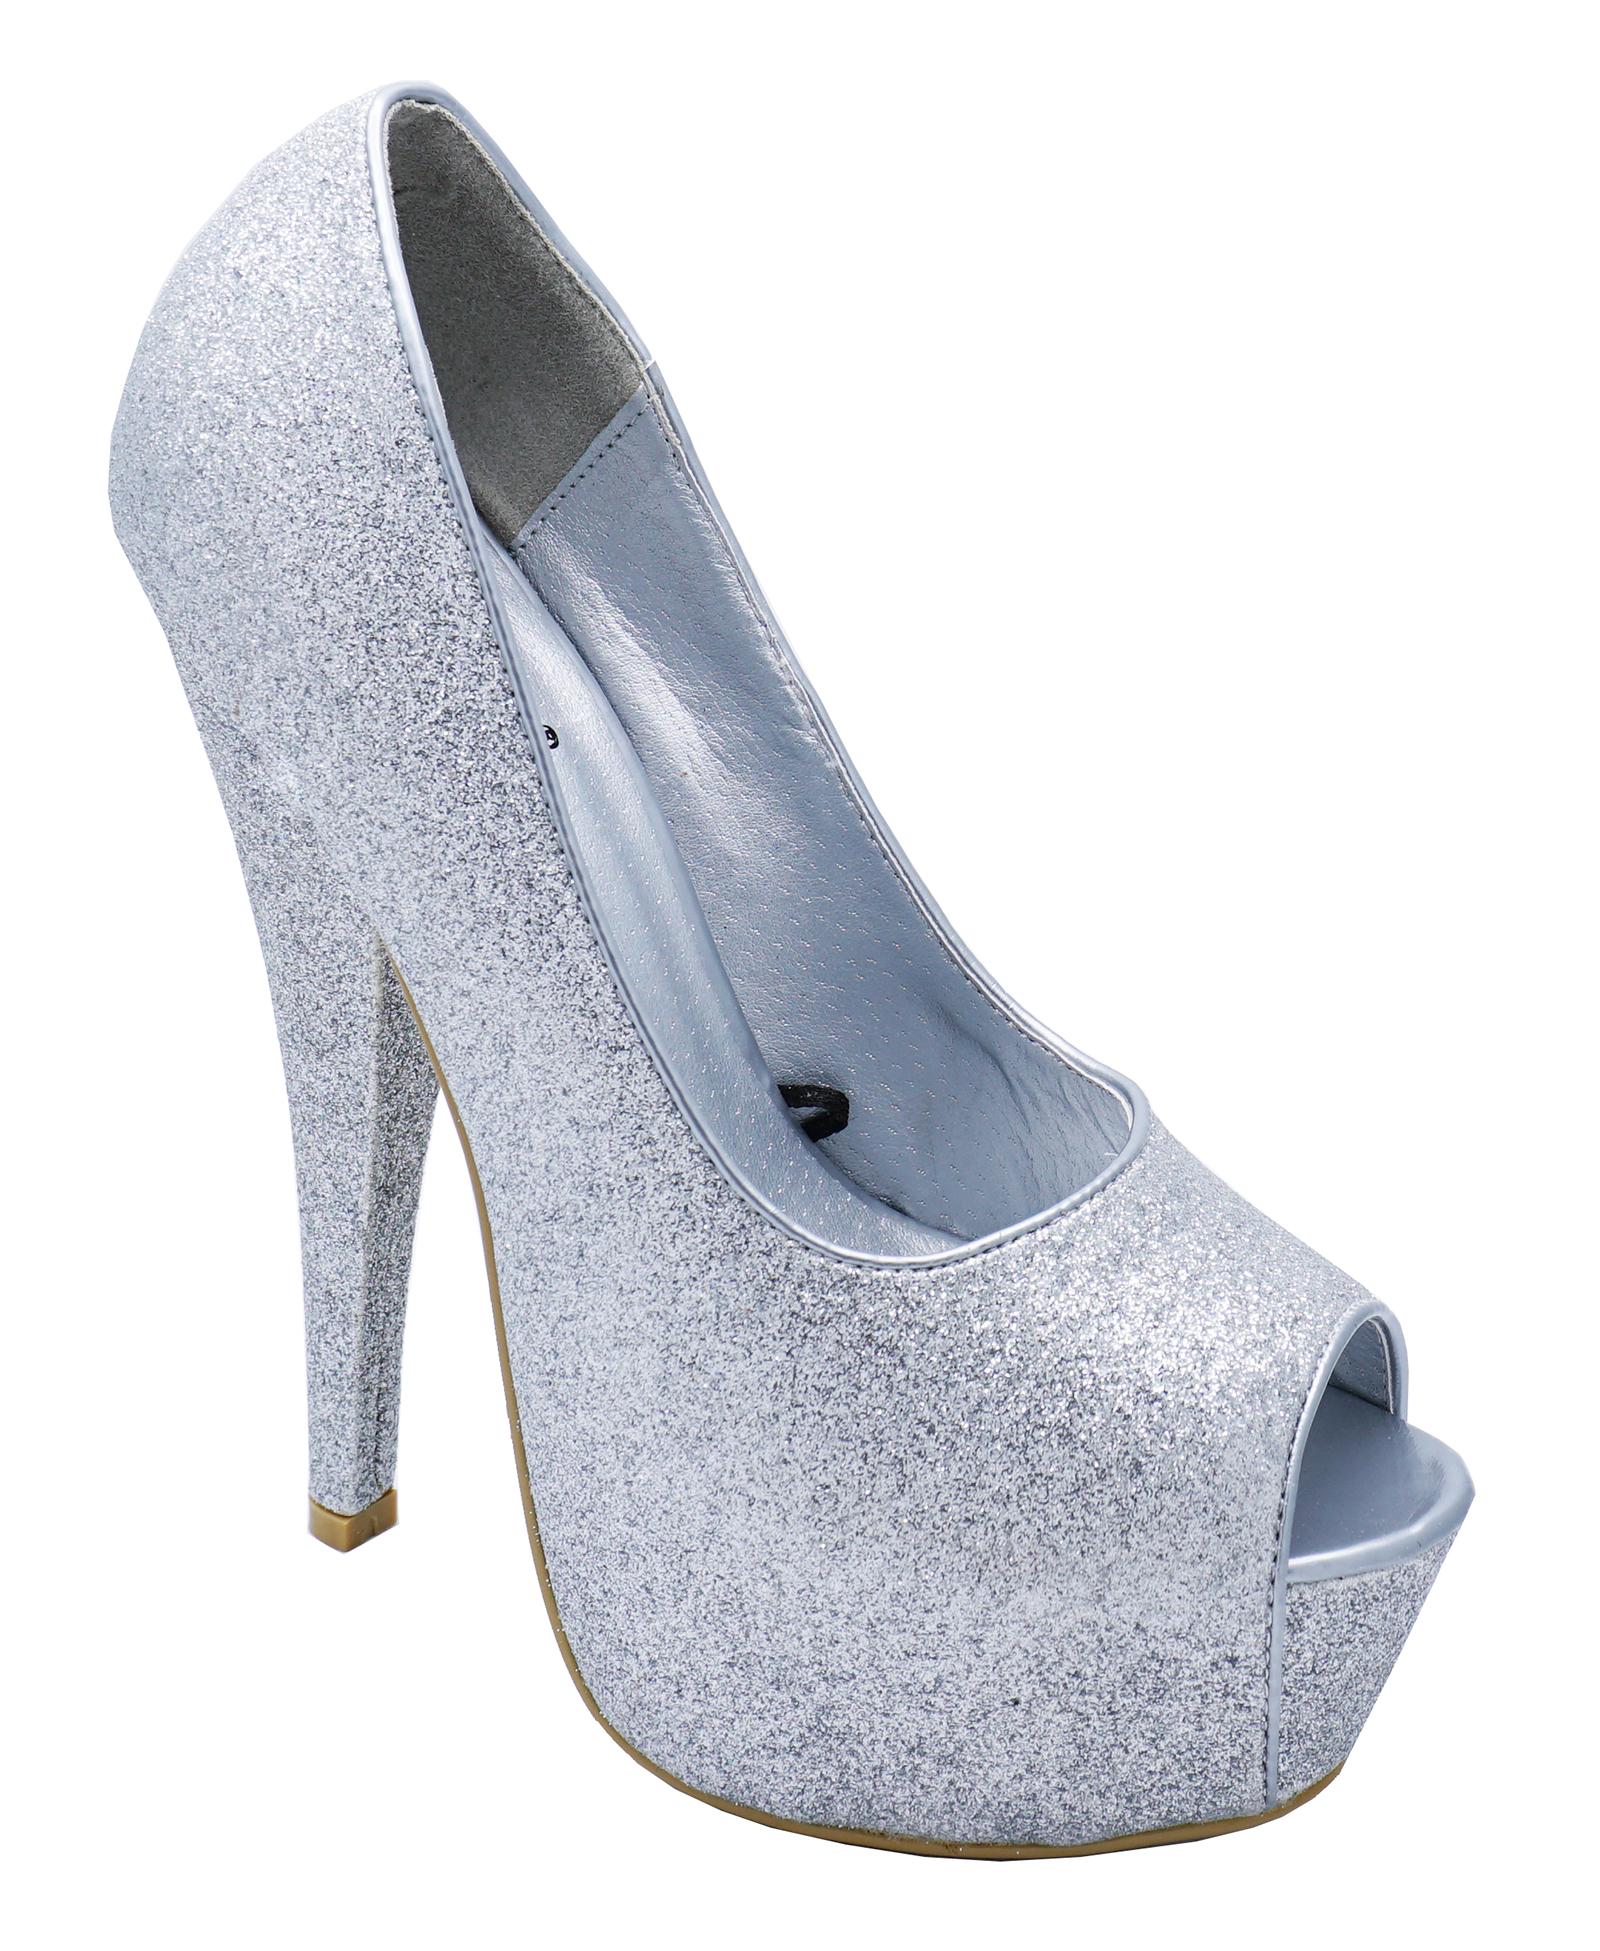 Shoekandi Suede Wedge Peep Toe Platform Shoes Ankle Strap